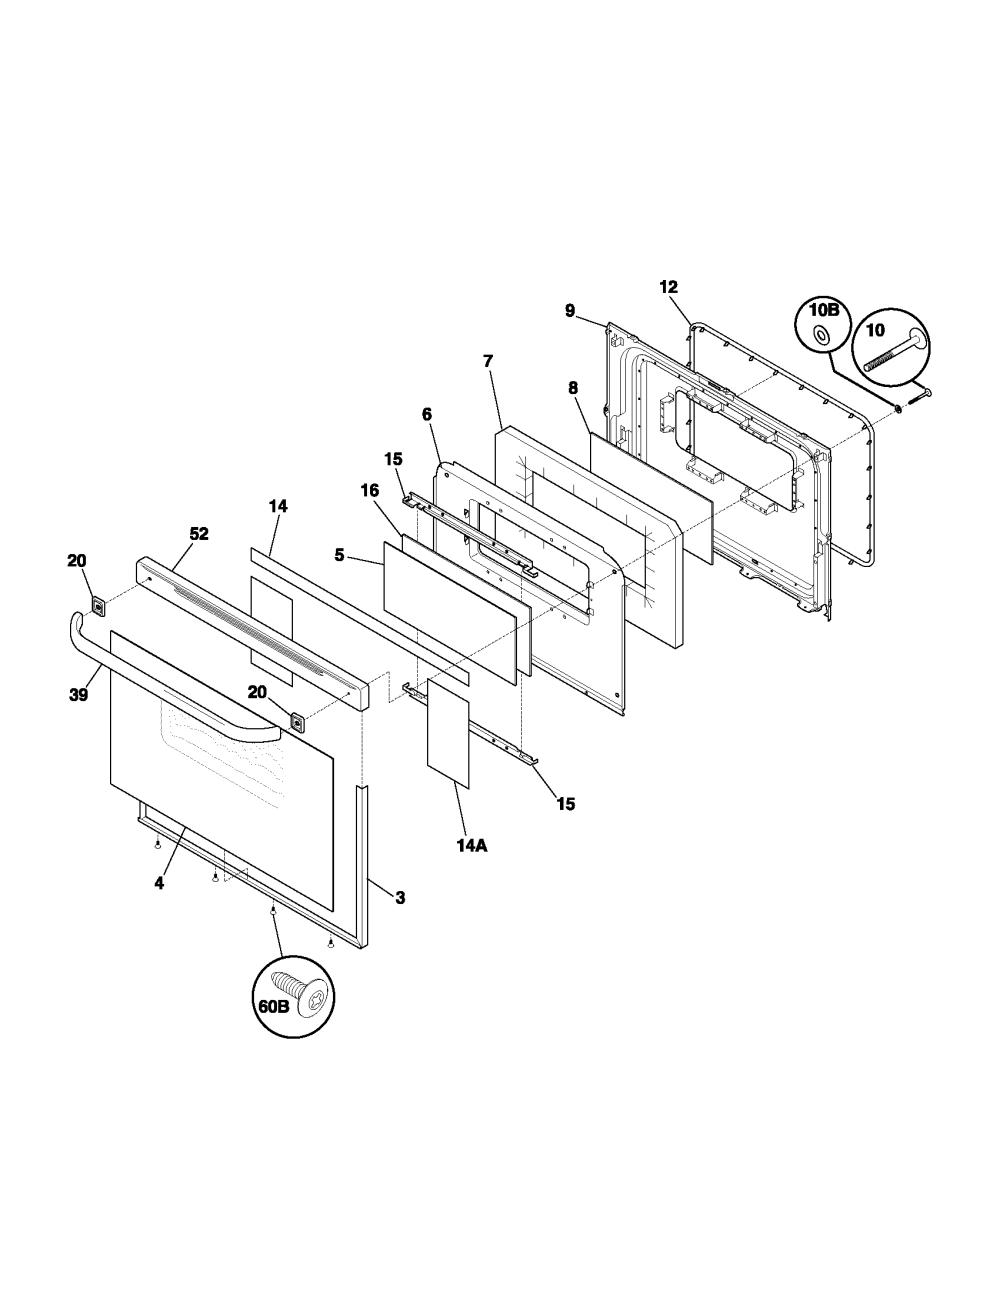 medium resolution of fef352asf electric range door parts diagram wiring schematic parts diagram